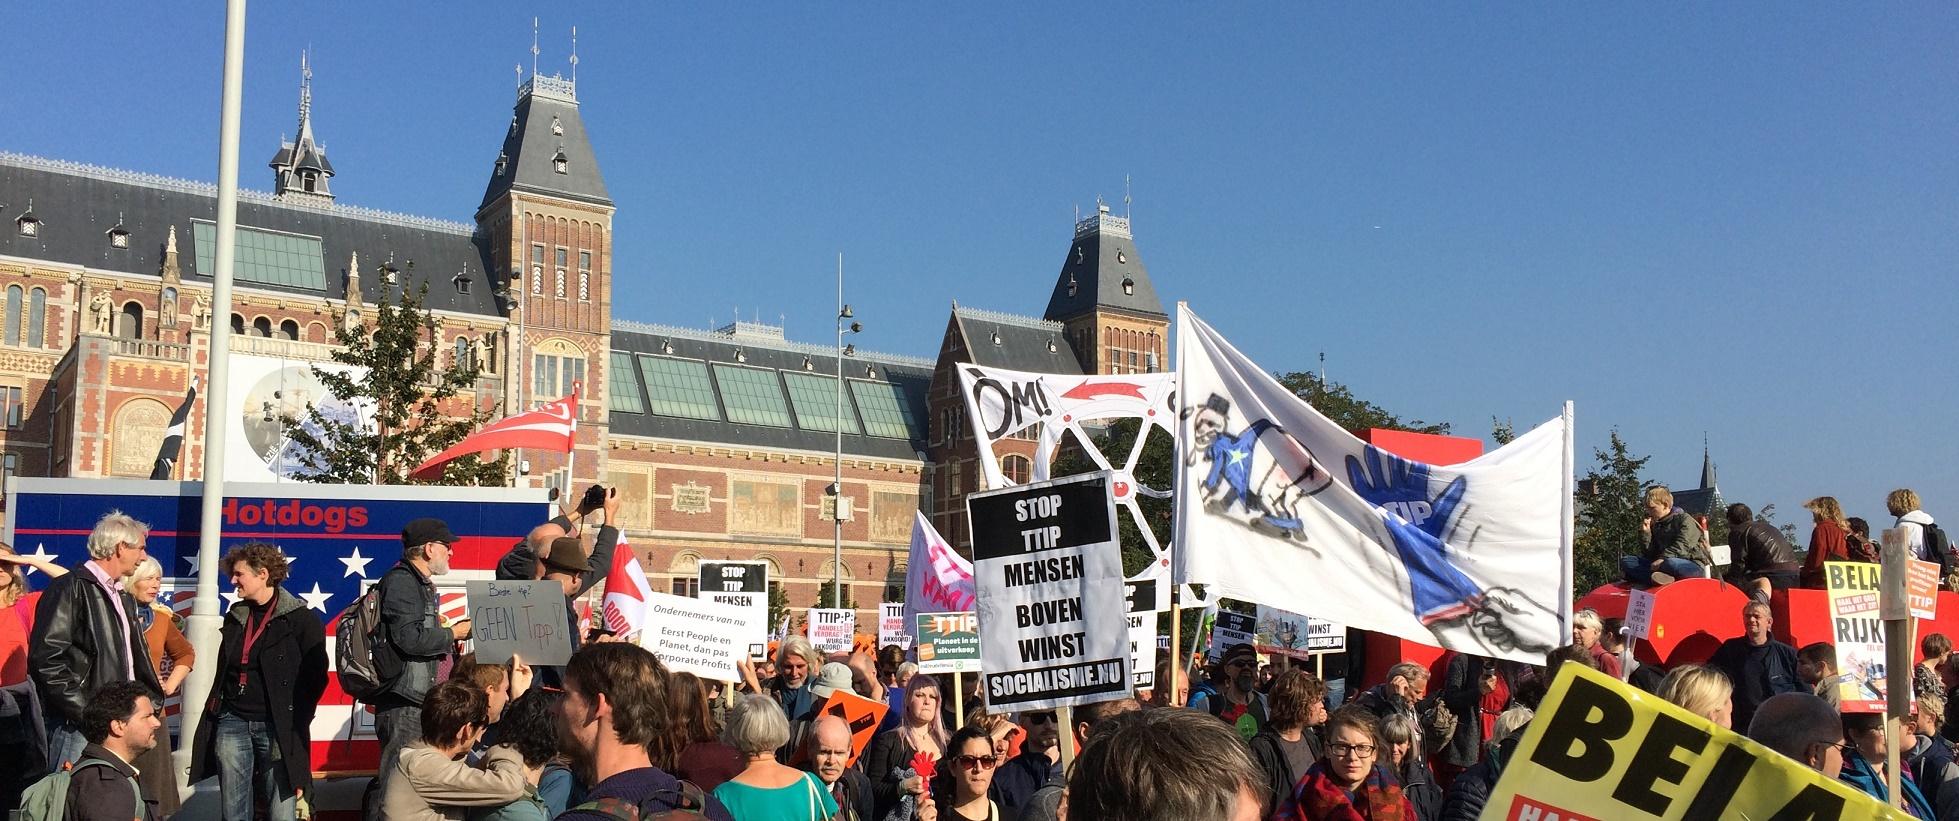 TTIP demo Amsterdam Jonas Danielplein naar Museumplein, JW was er